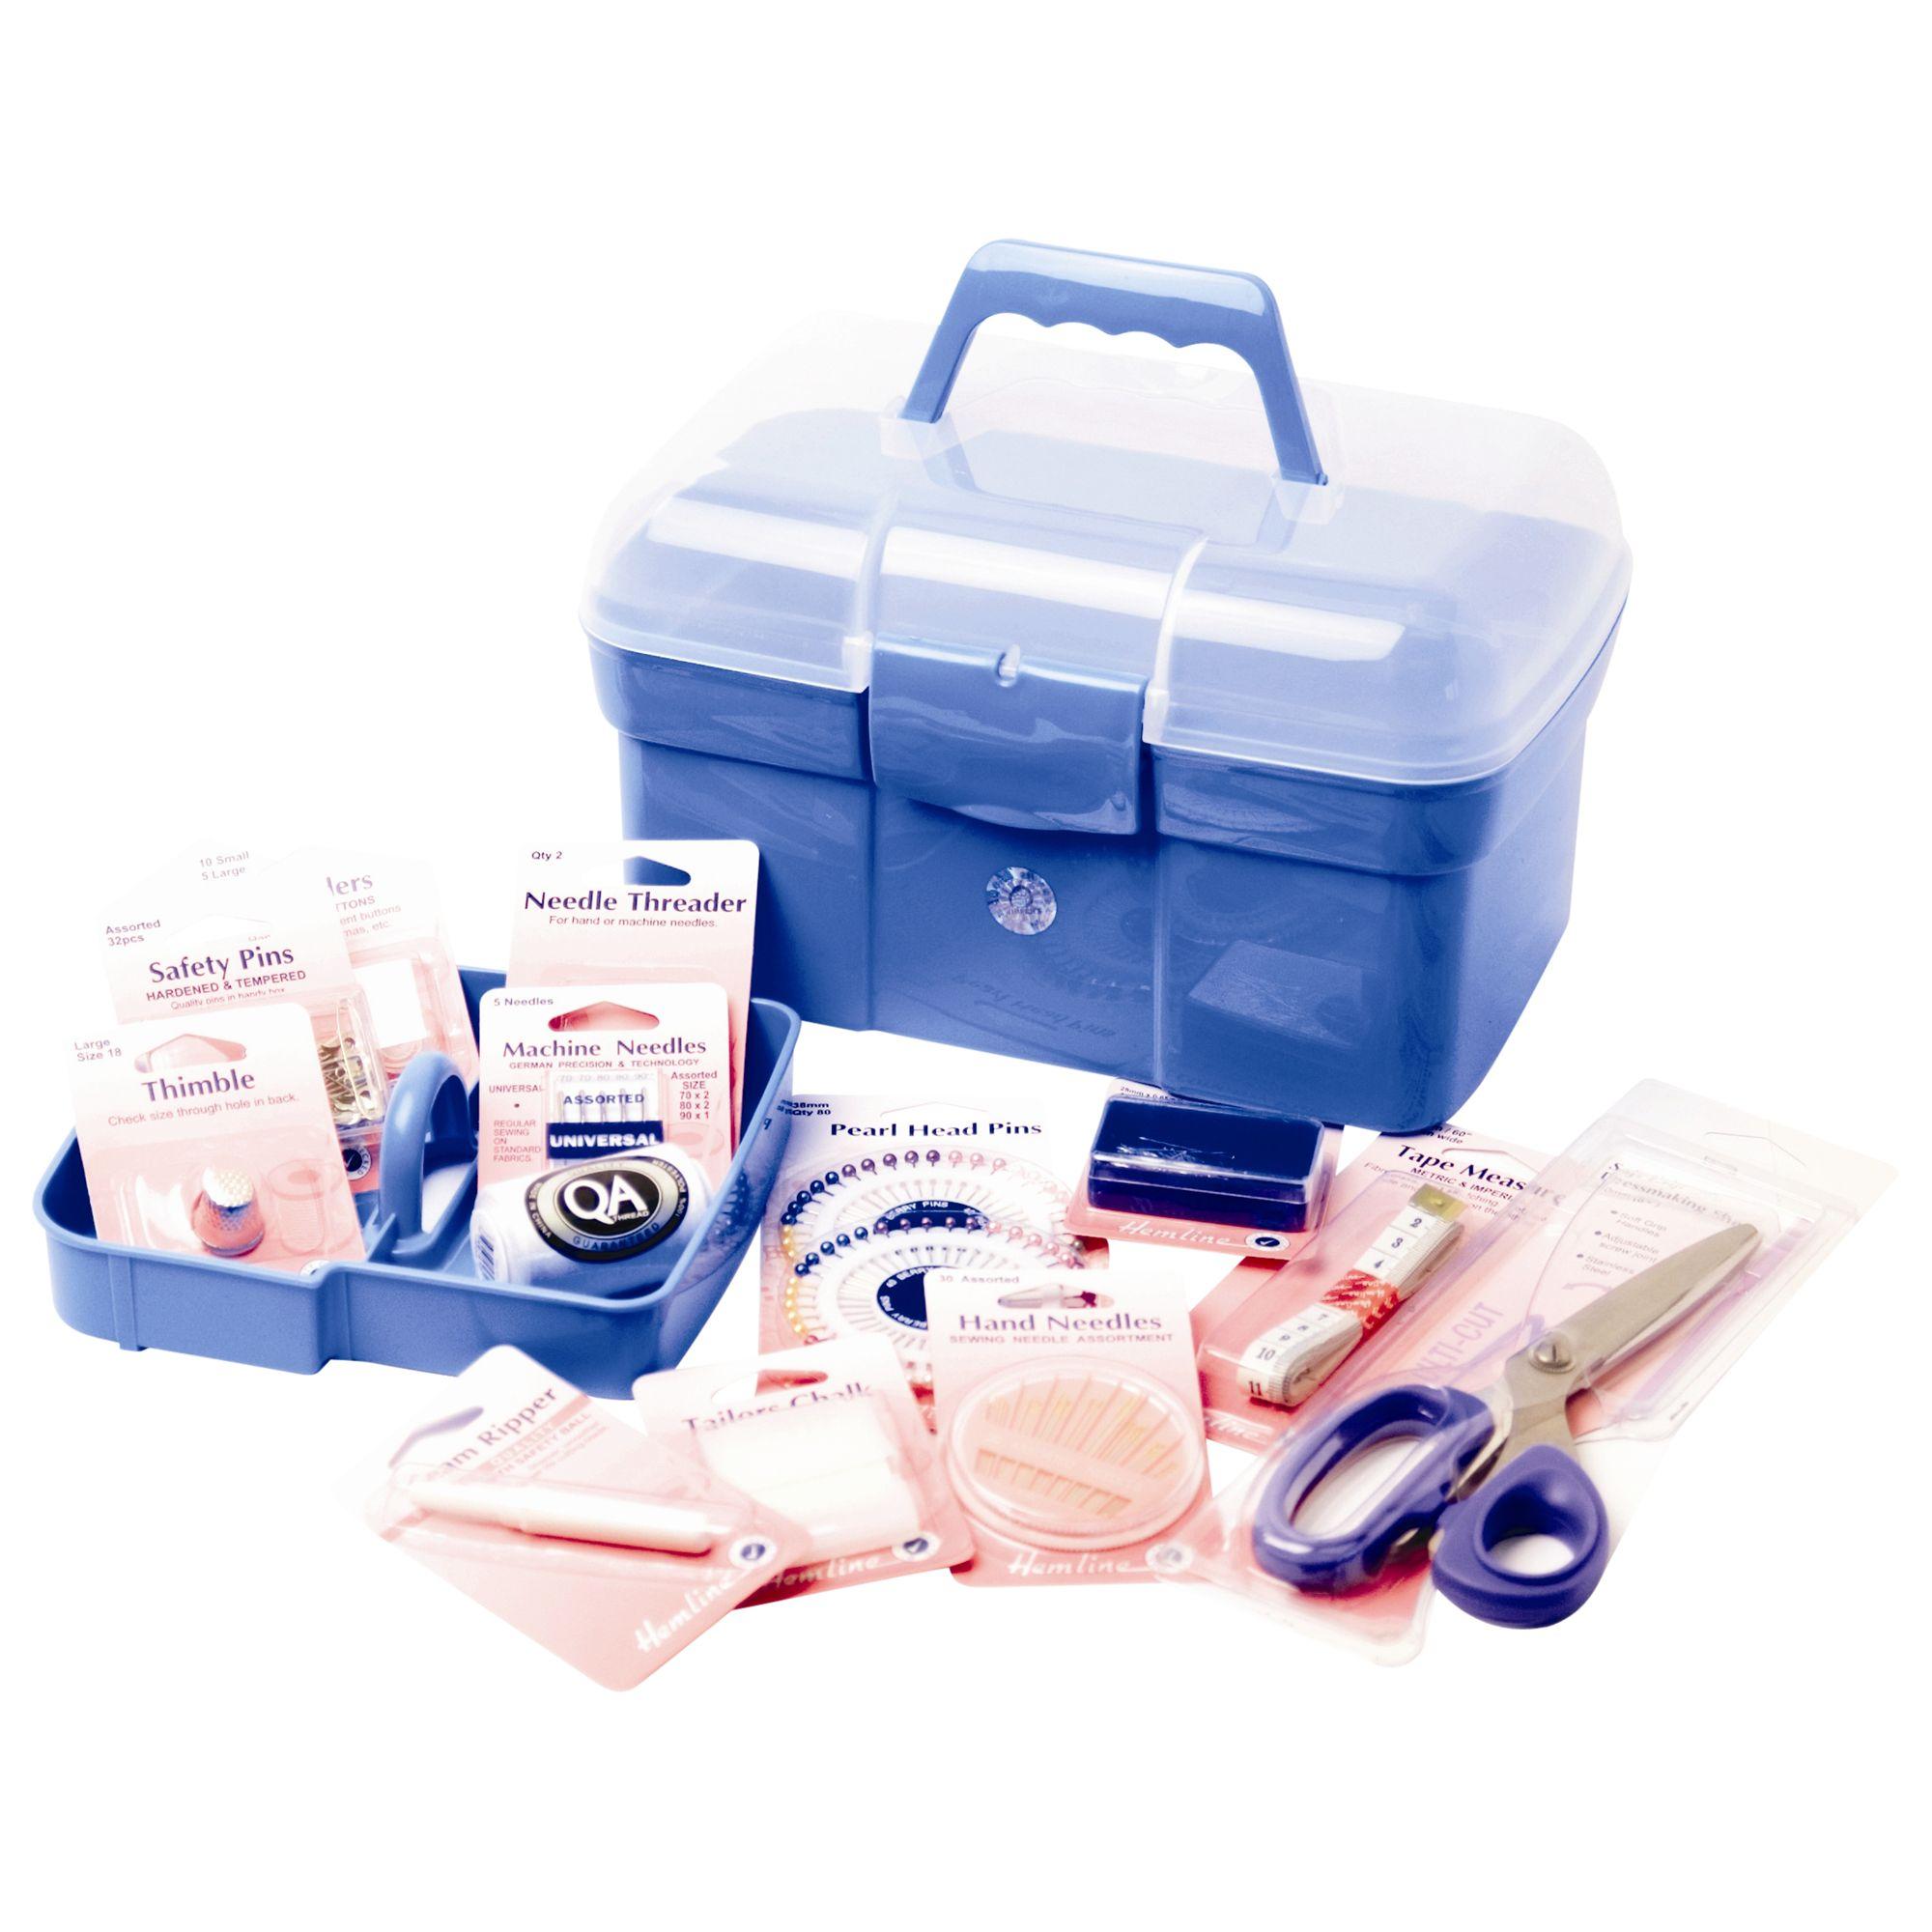 Hemline Hemline Complete Sewing Kit